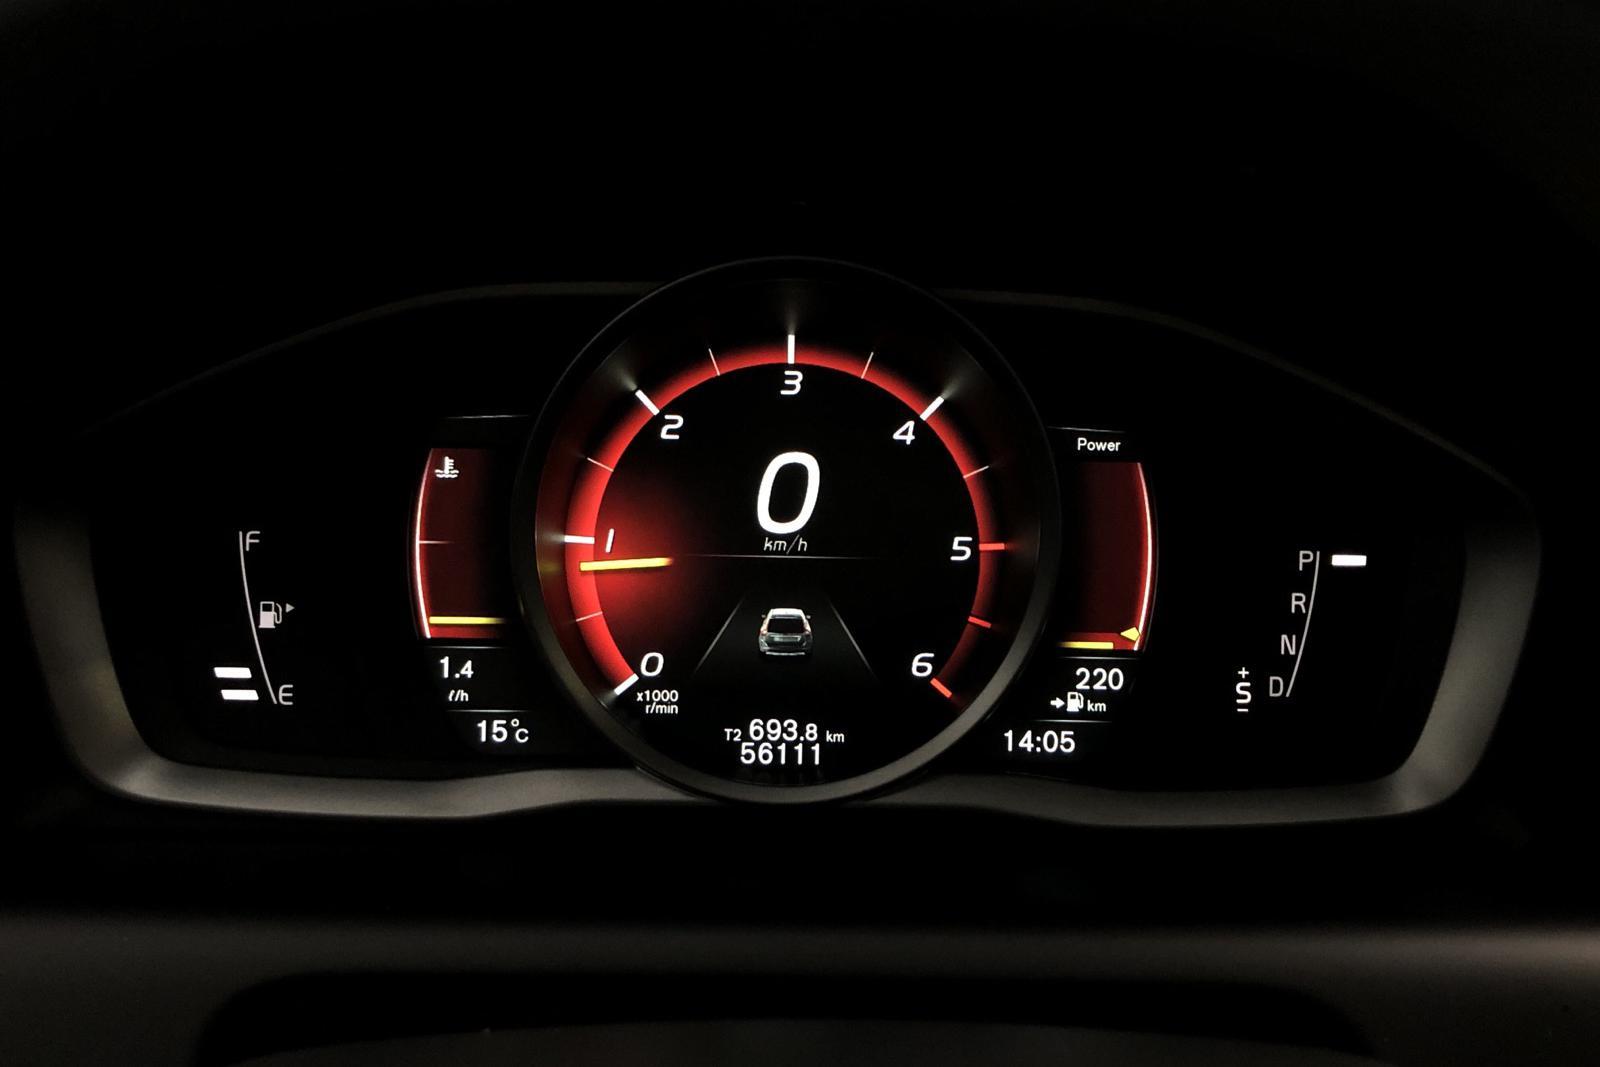 Volvo XC60 D4 2WD (190hk) - 56 500 km - Automatic - gray - 2017